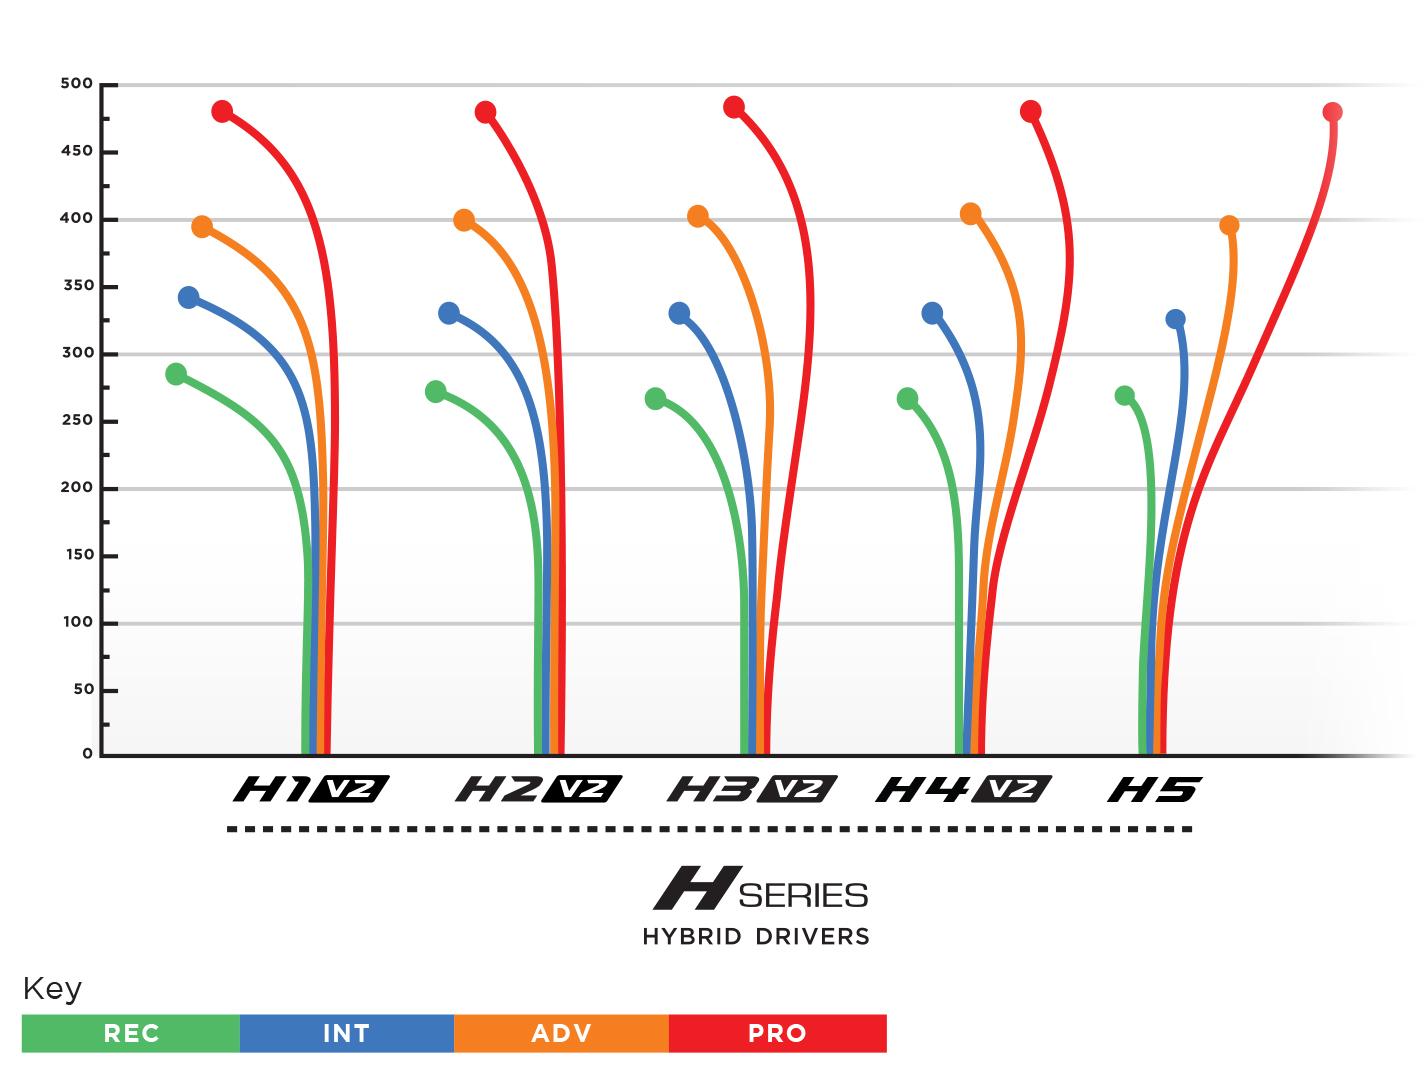 prodigy_h_series_flight_chart_apr_2019.jpg